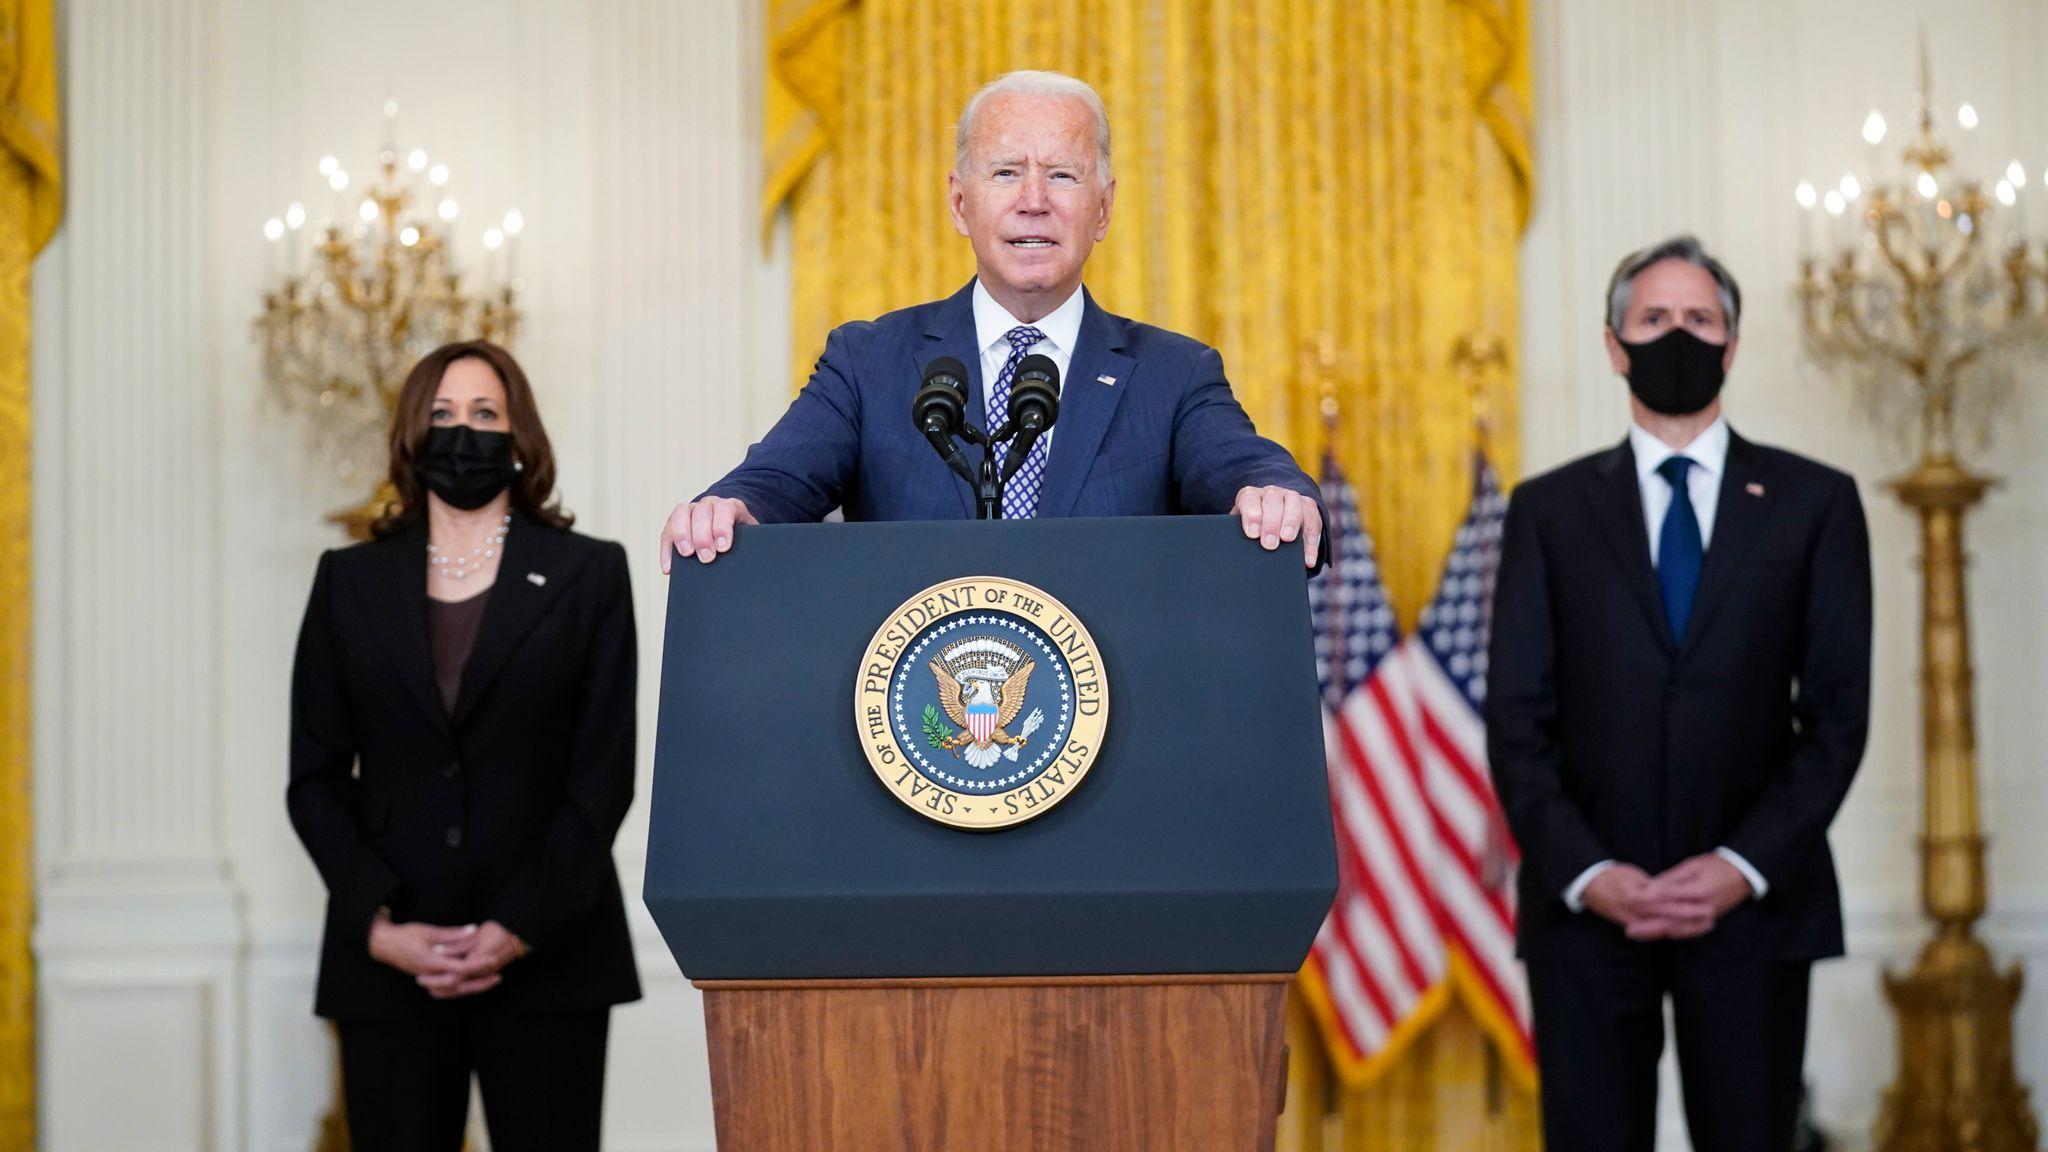 Kamala Harris and Antony Blinken flank Joe Biden as he gives remarks about US imperialism in Afghanistan